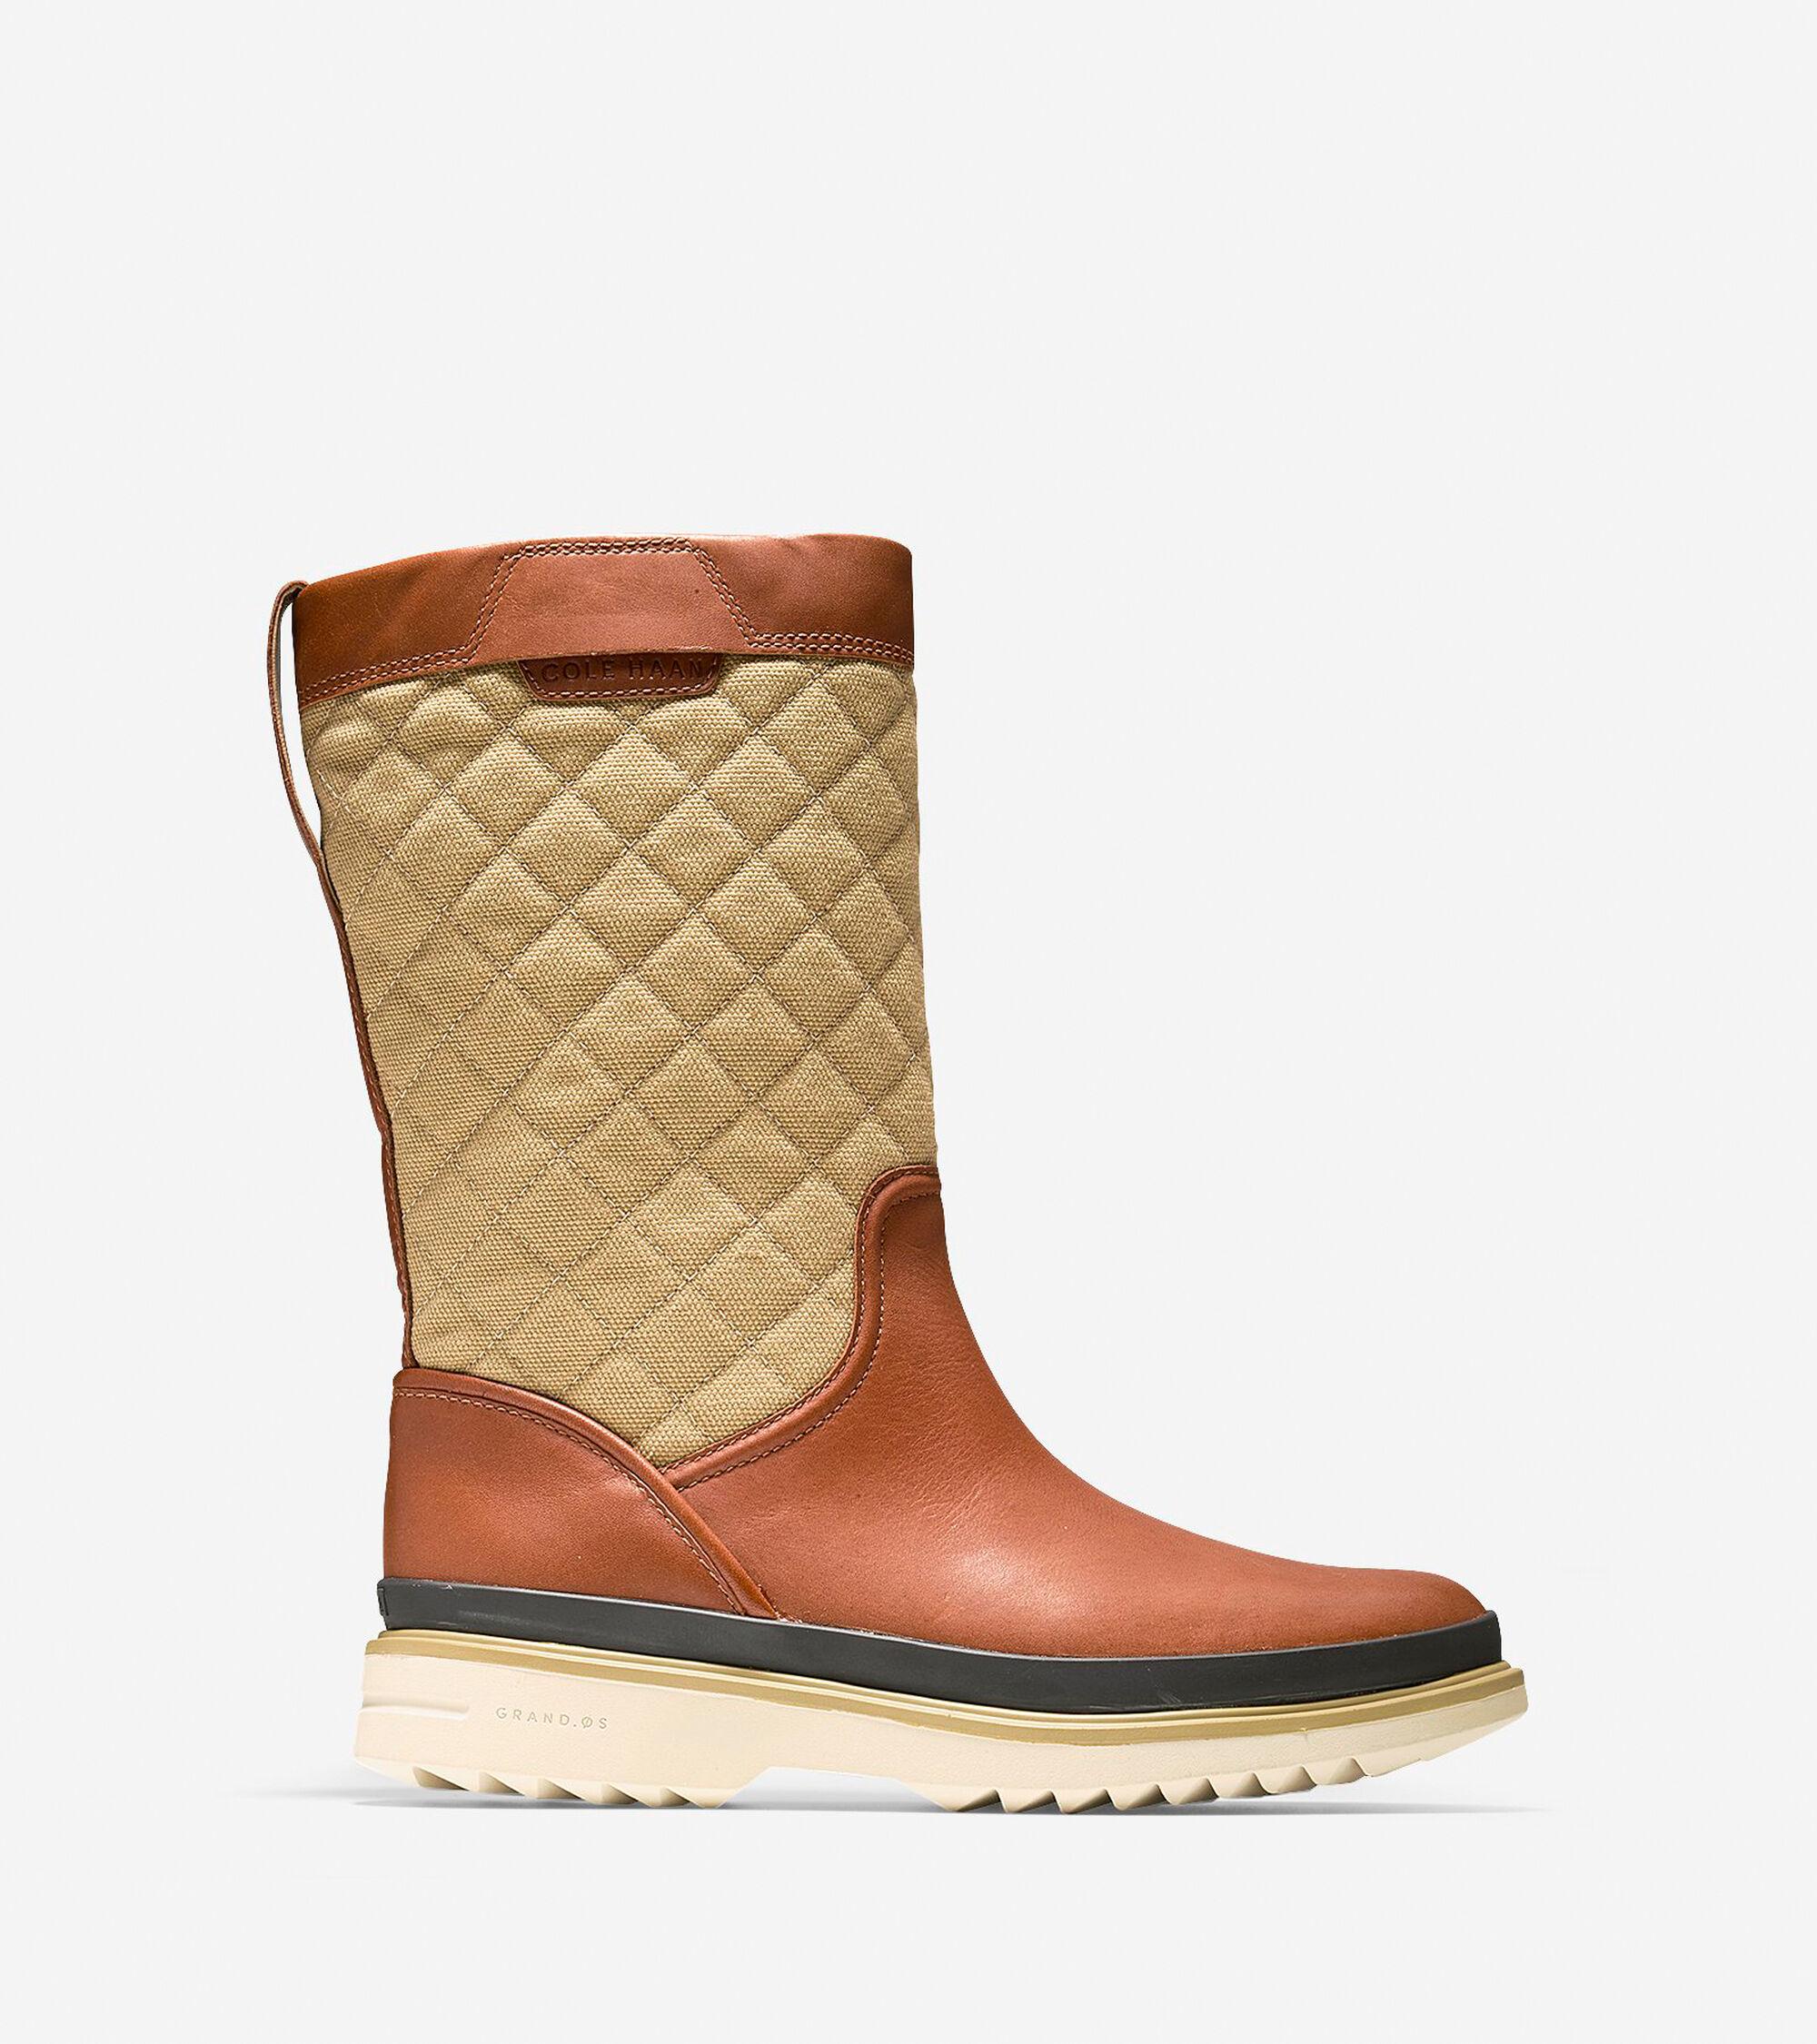 Cole Haan Millbridge Waterproof Pull On Boots